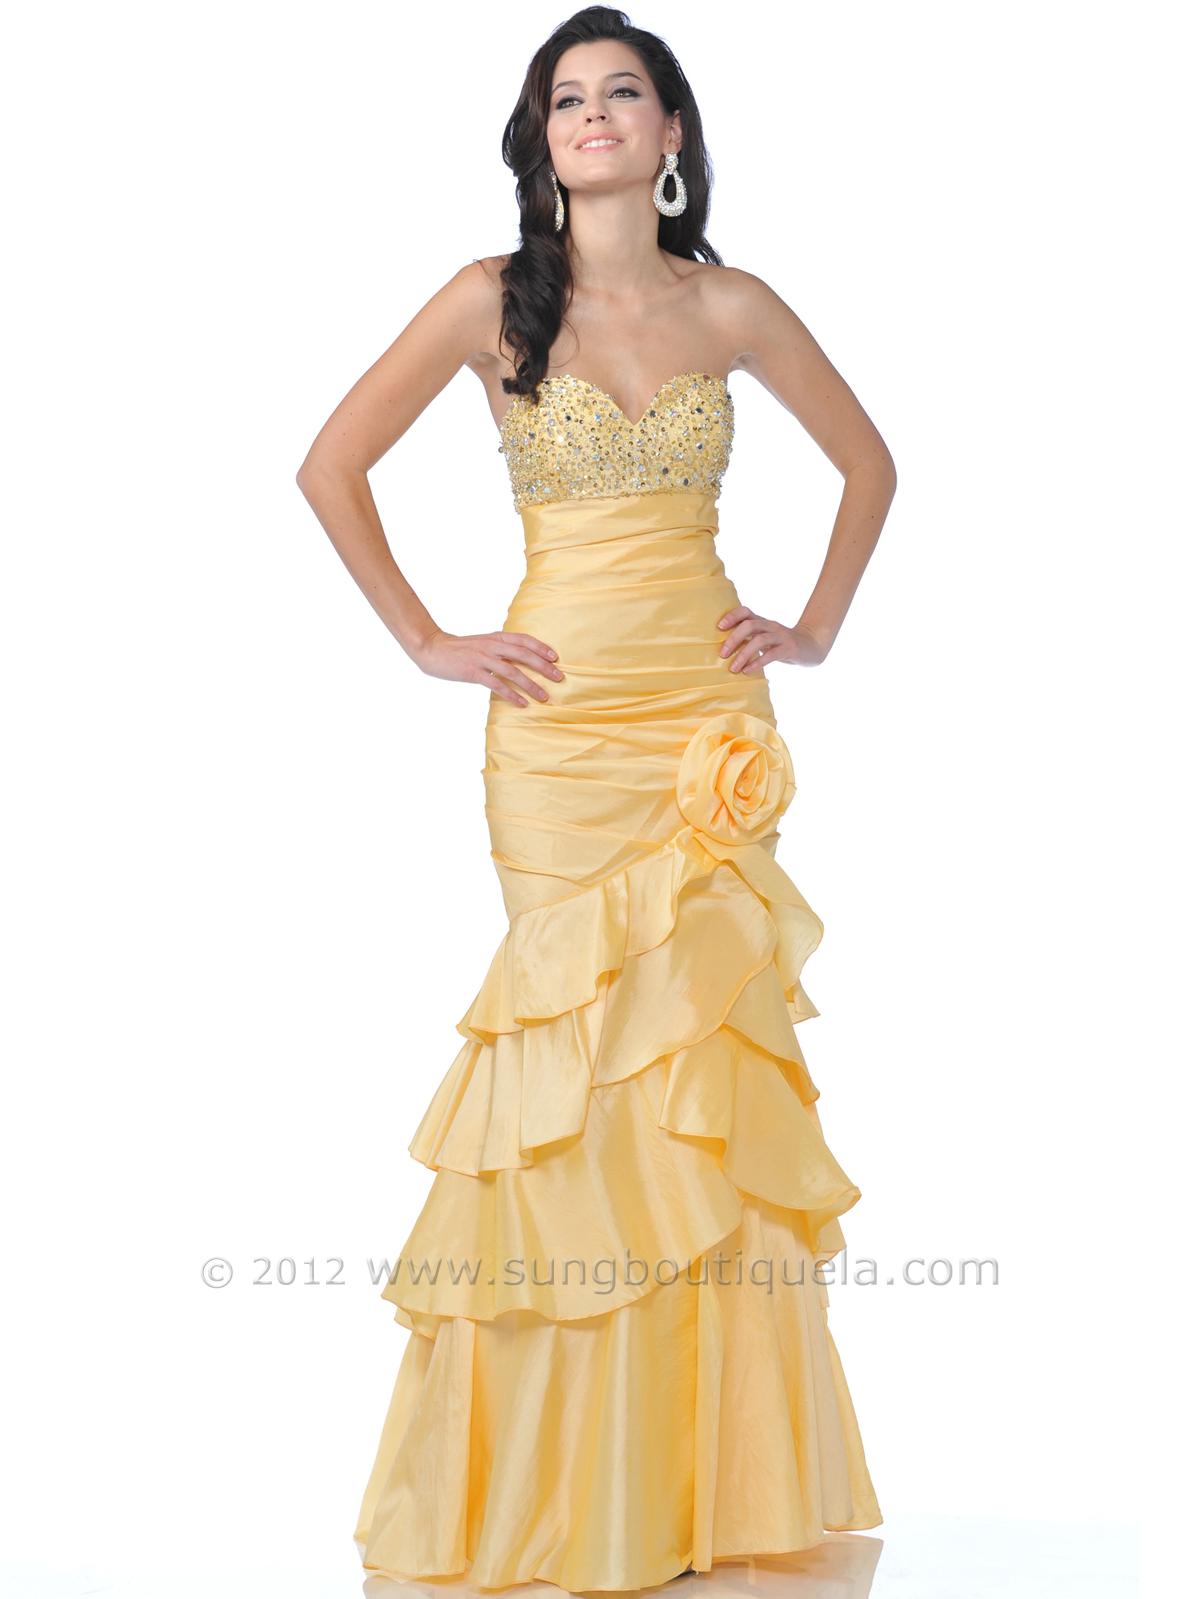 Yellow Strapless Taffeta Prom Dress | Sung Boutique L.A.